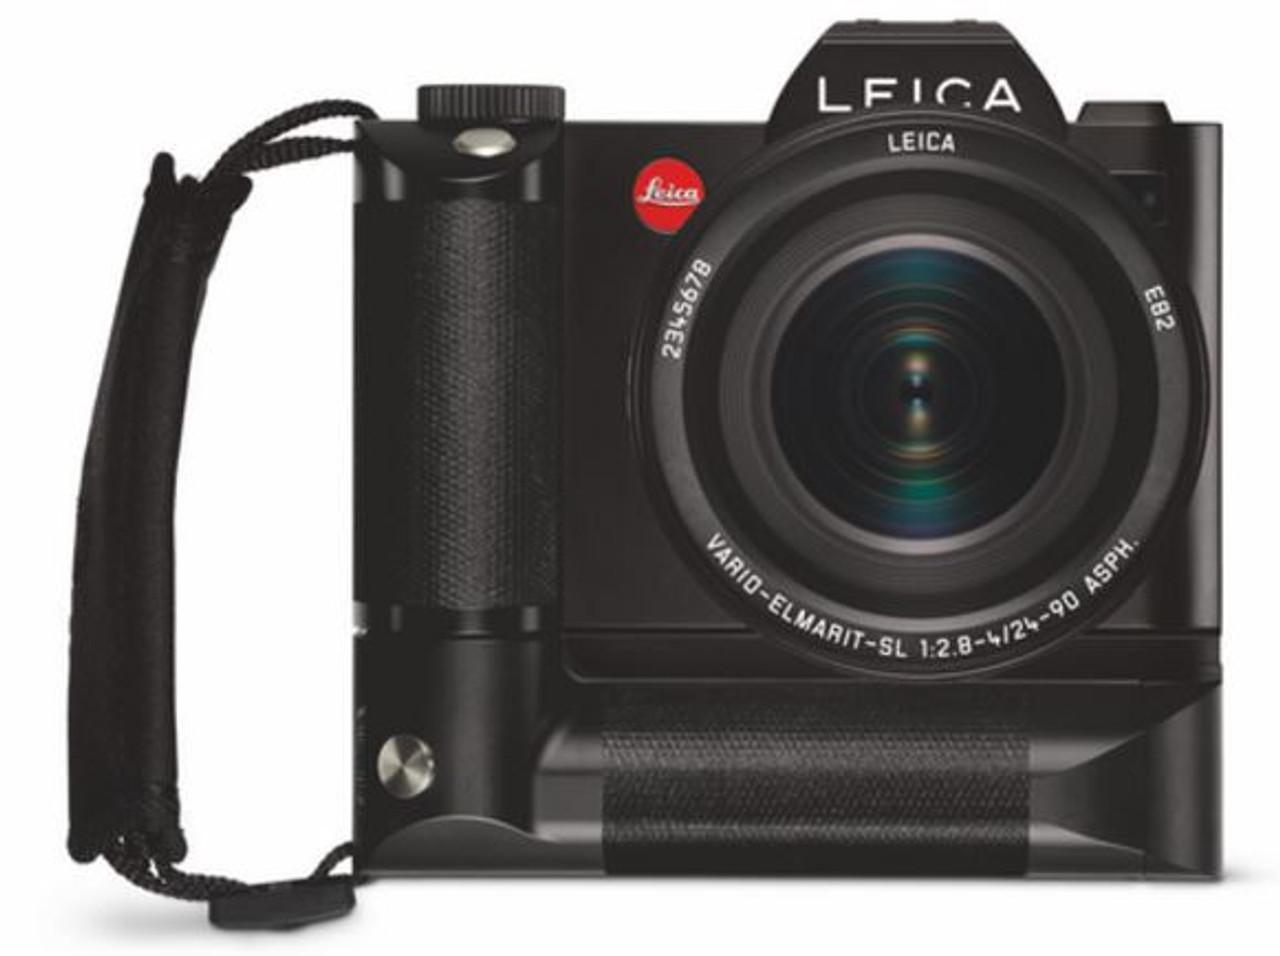 Leica Multi Function Handgrip HG SCL 4 #16063